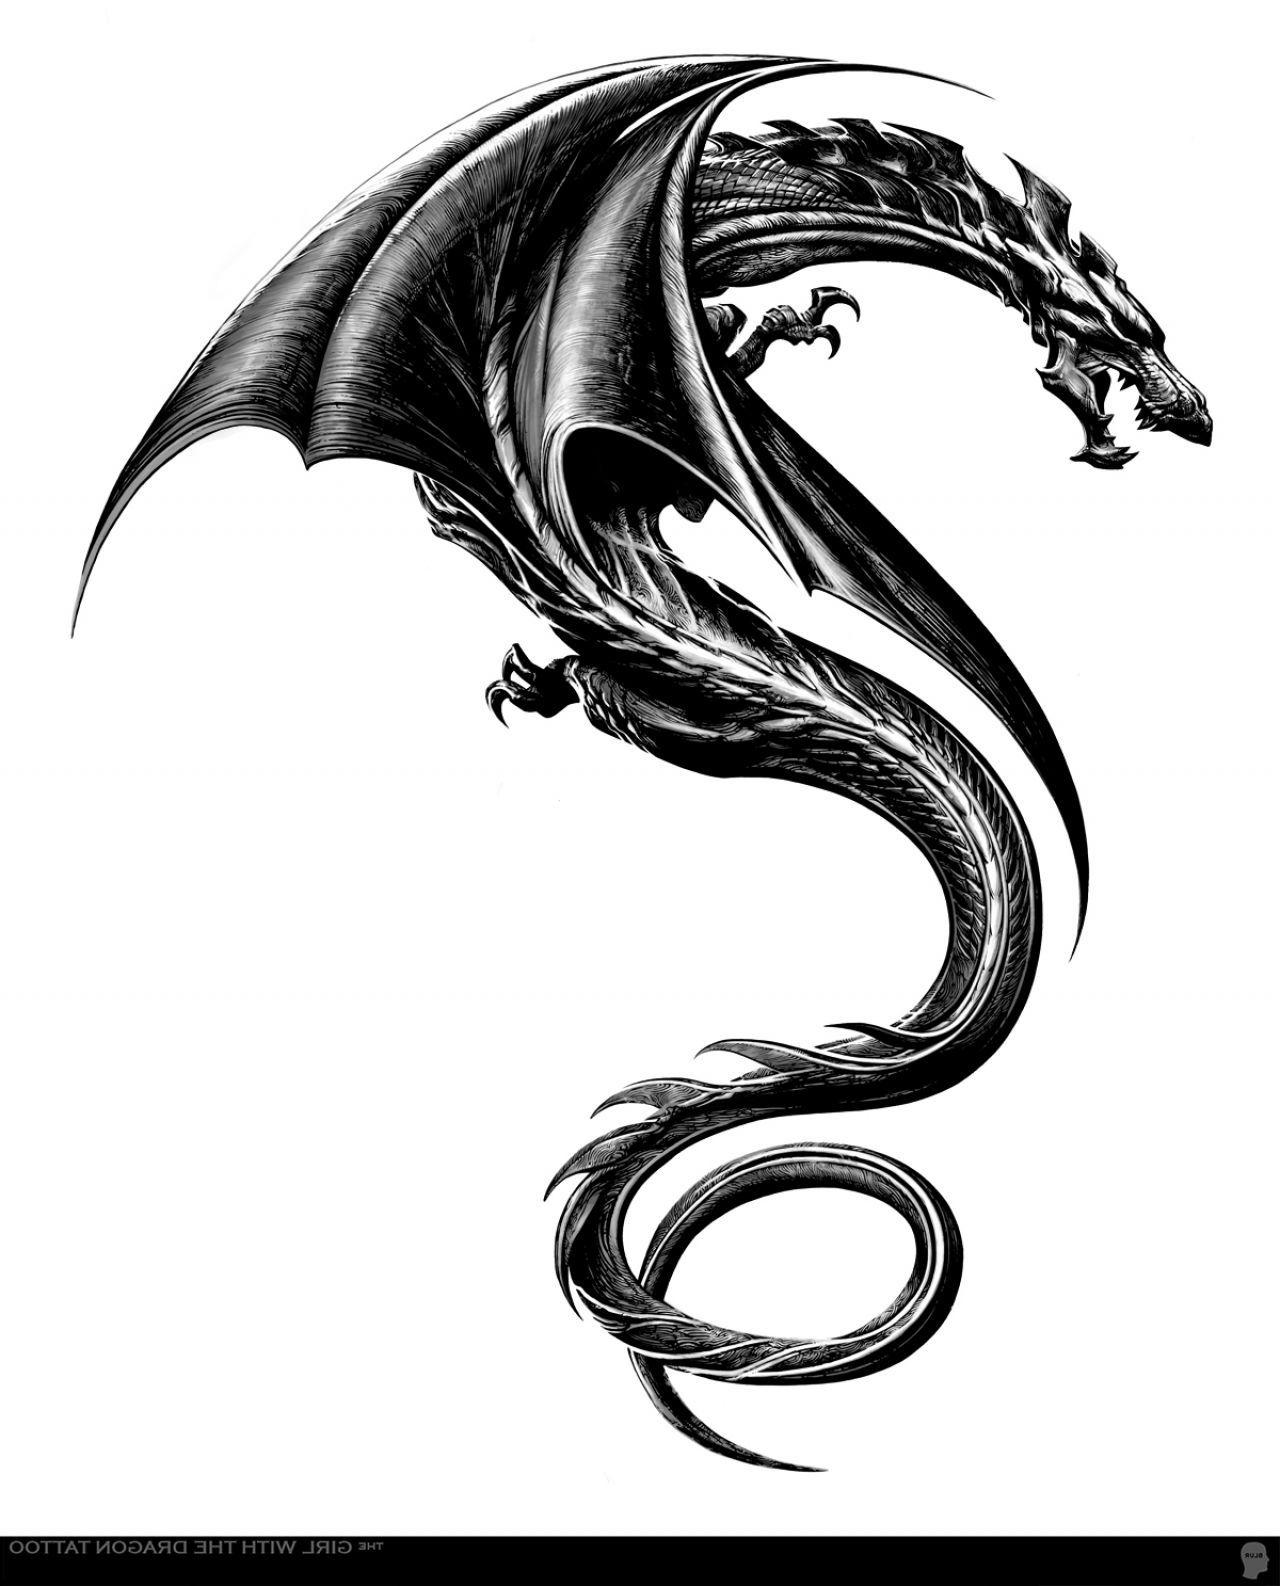 chinese dragon tattoos tattoo art ideas dragon pinterest chinese dragon tattoos chinese. Black Bedroom Furniture Sets. Home Design Ideas